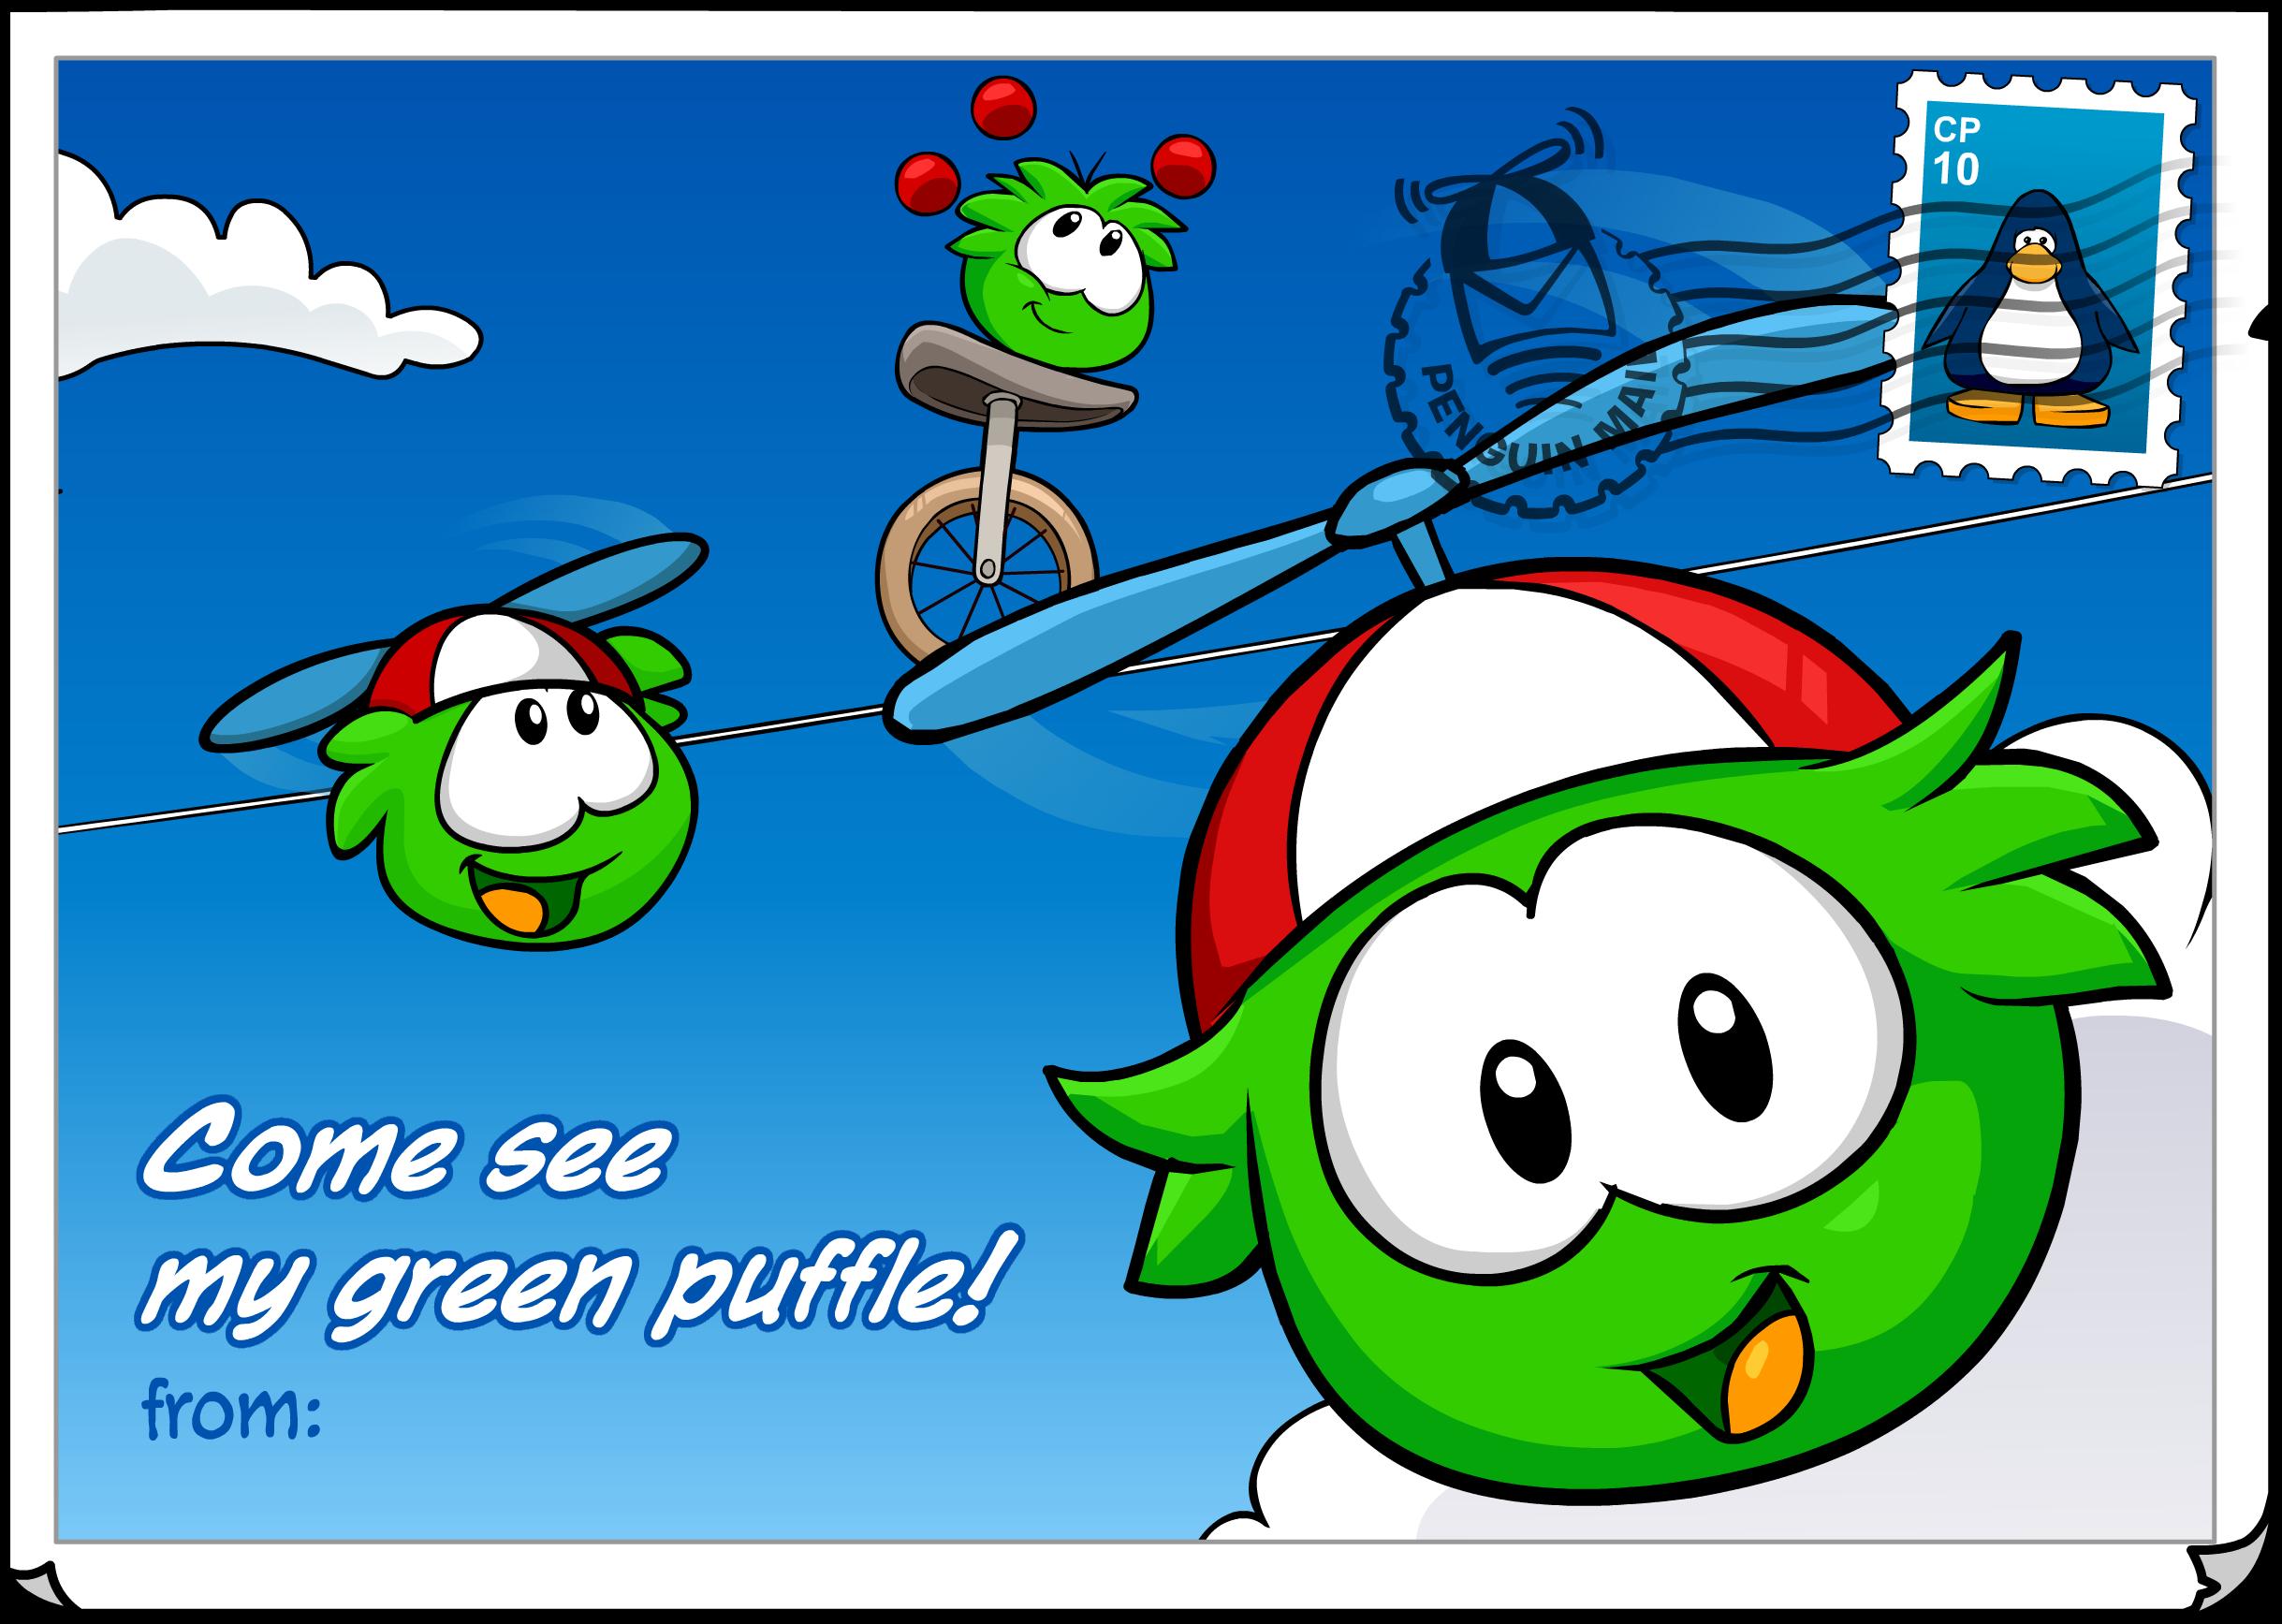 Green Puffle Postcard